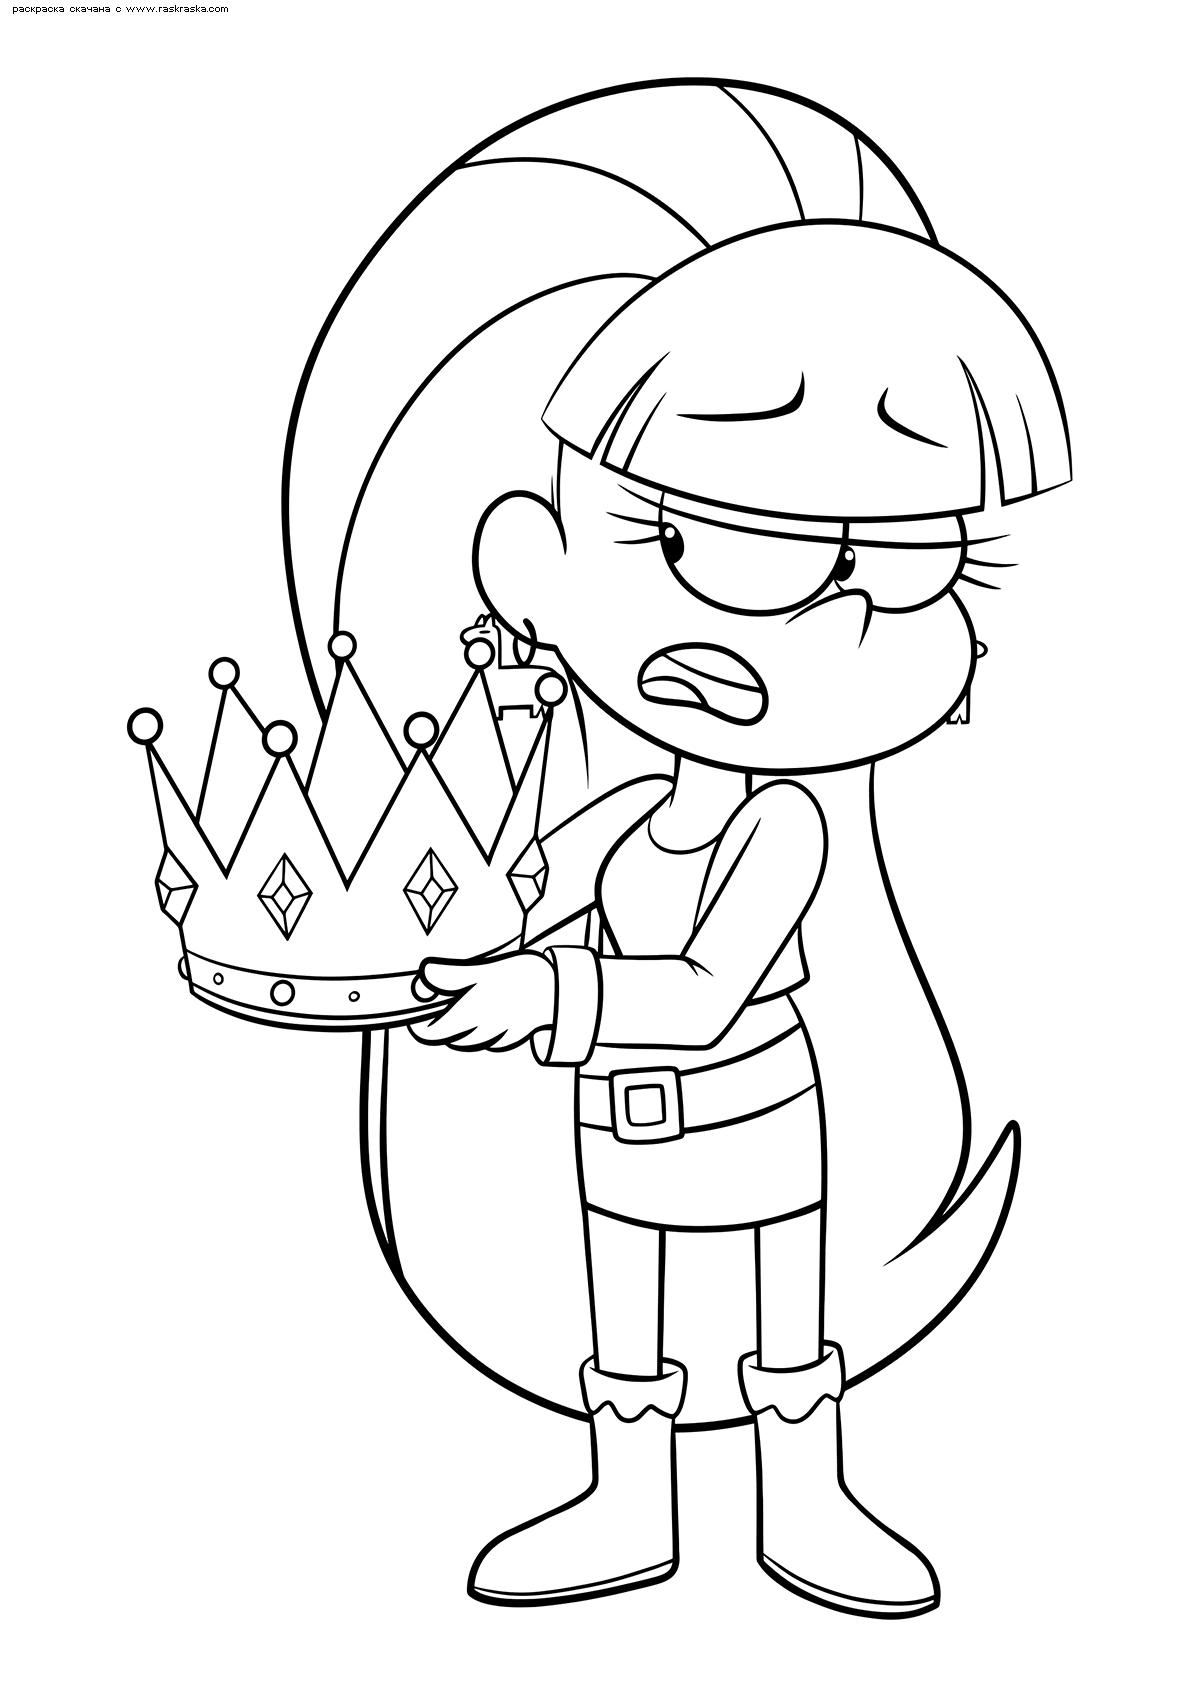 Раскраска Пасифика с короной. Раскраска Девочка